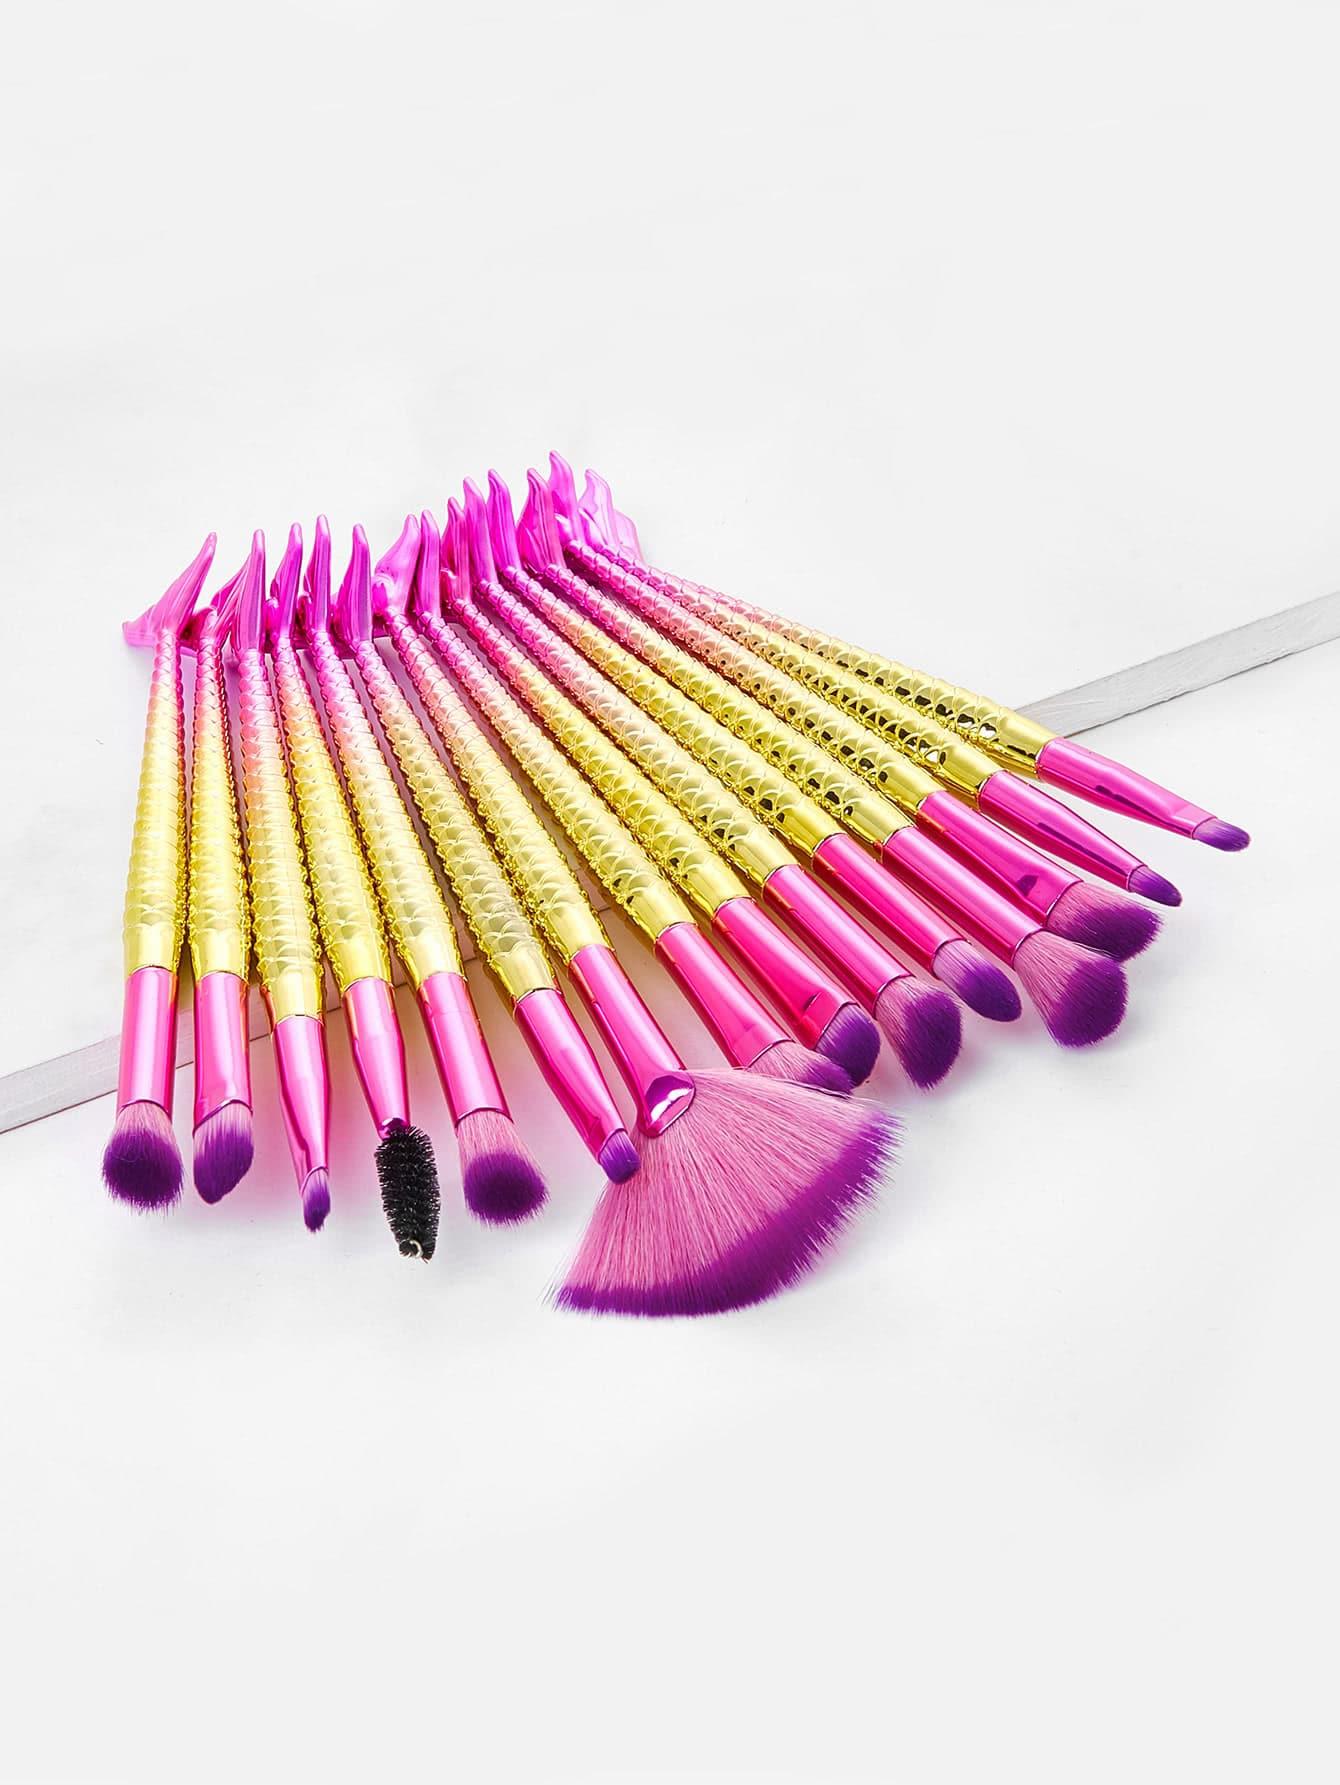 Ombre Mermaid Handle Makeup Brush 15pcs